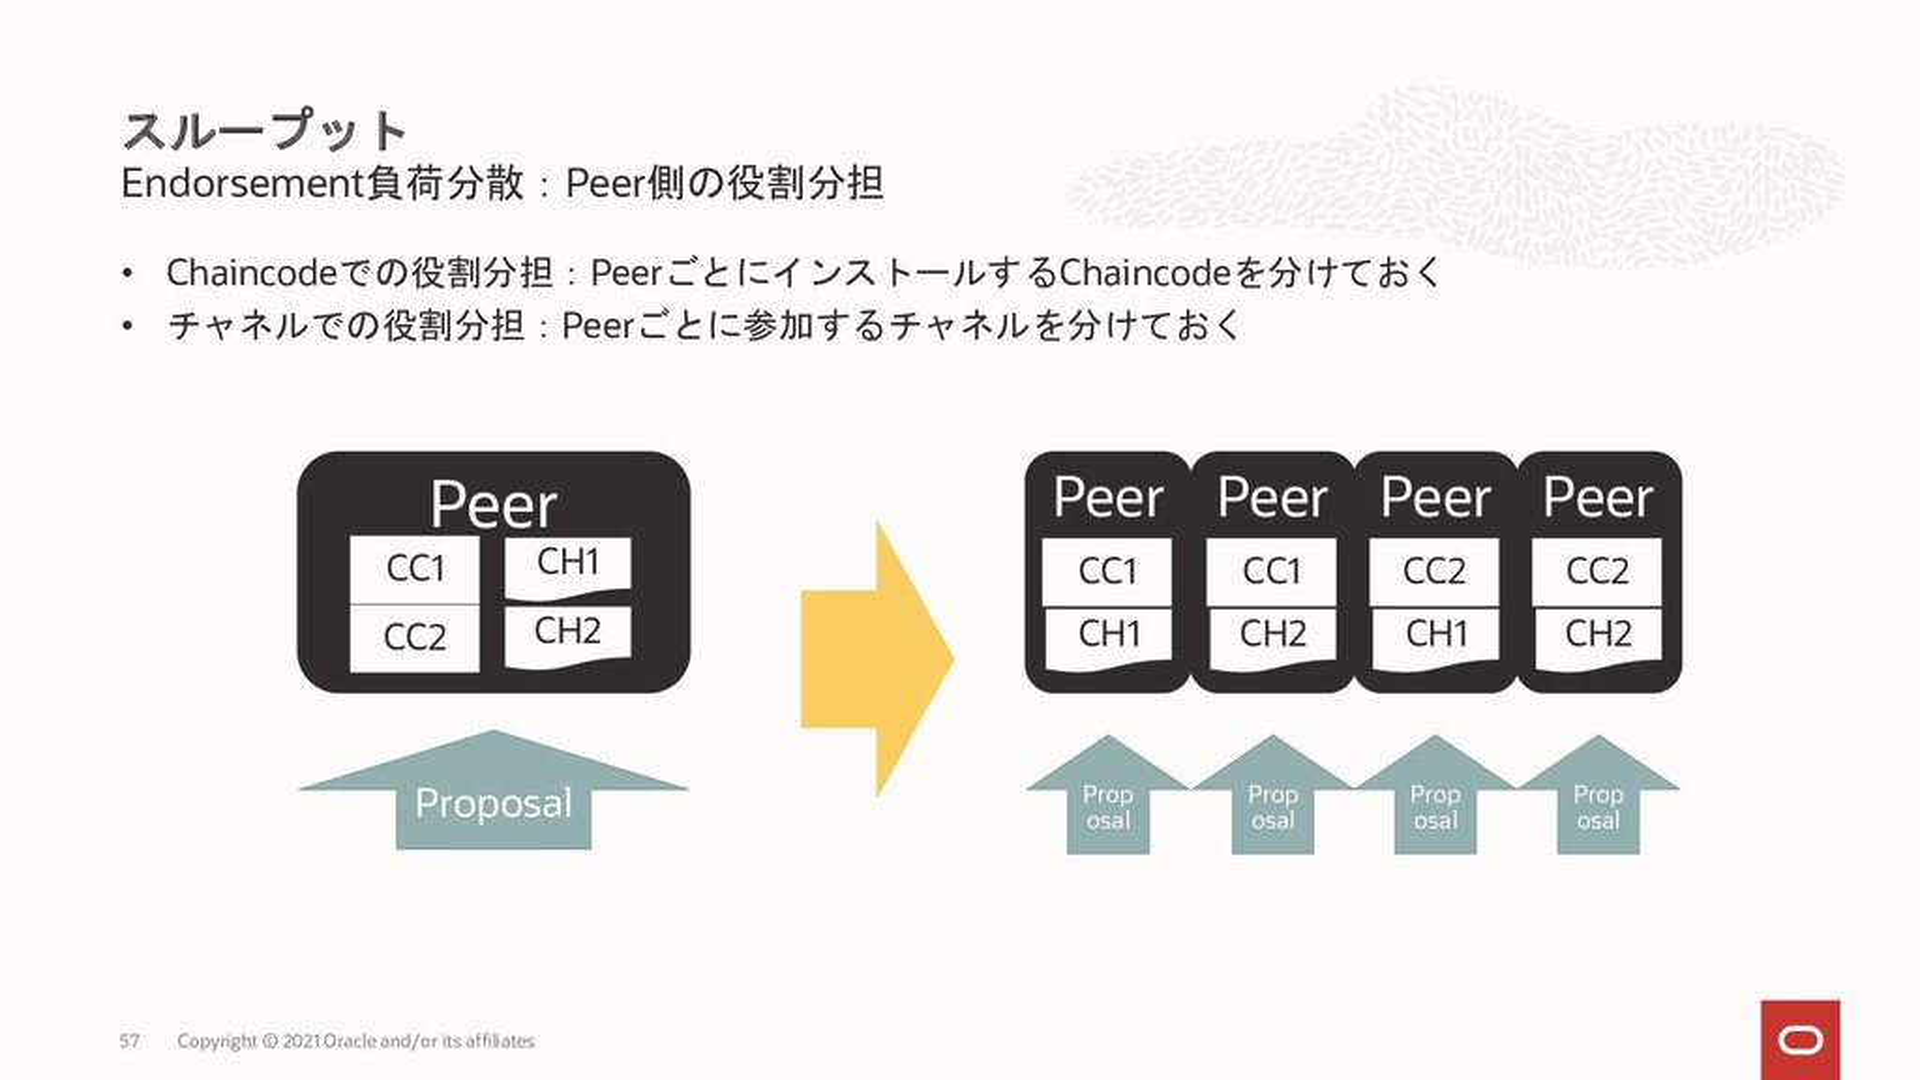 Endorsement負荷分散:Peer側の役割分担 • Chaincodeでの役割分担:Pe...